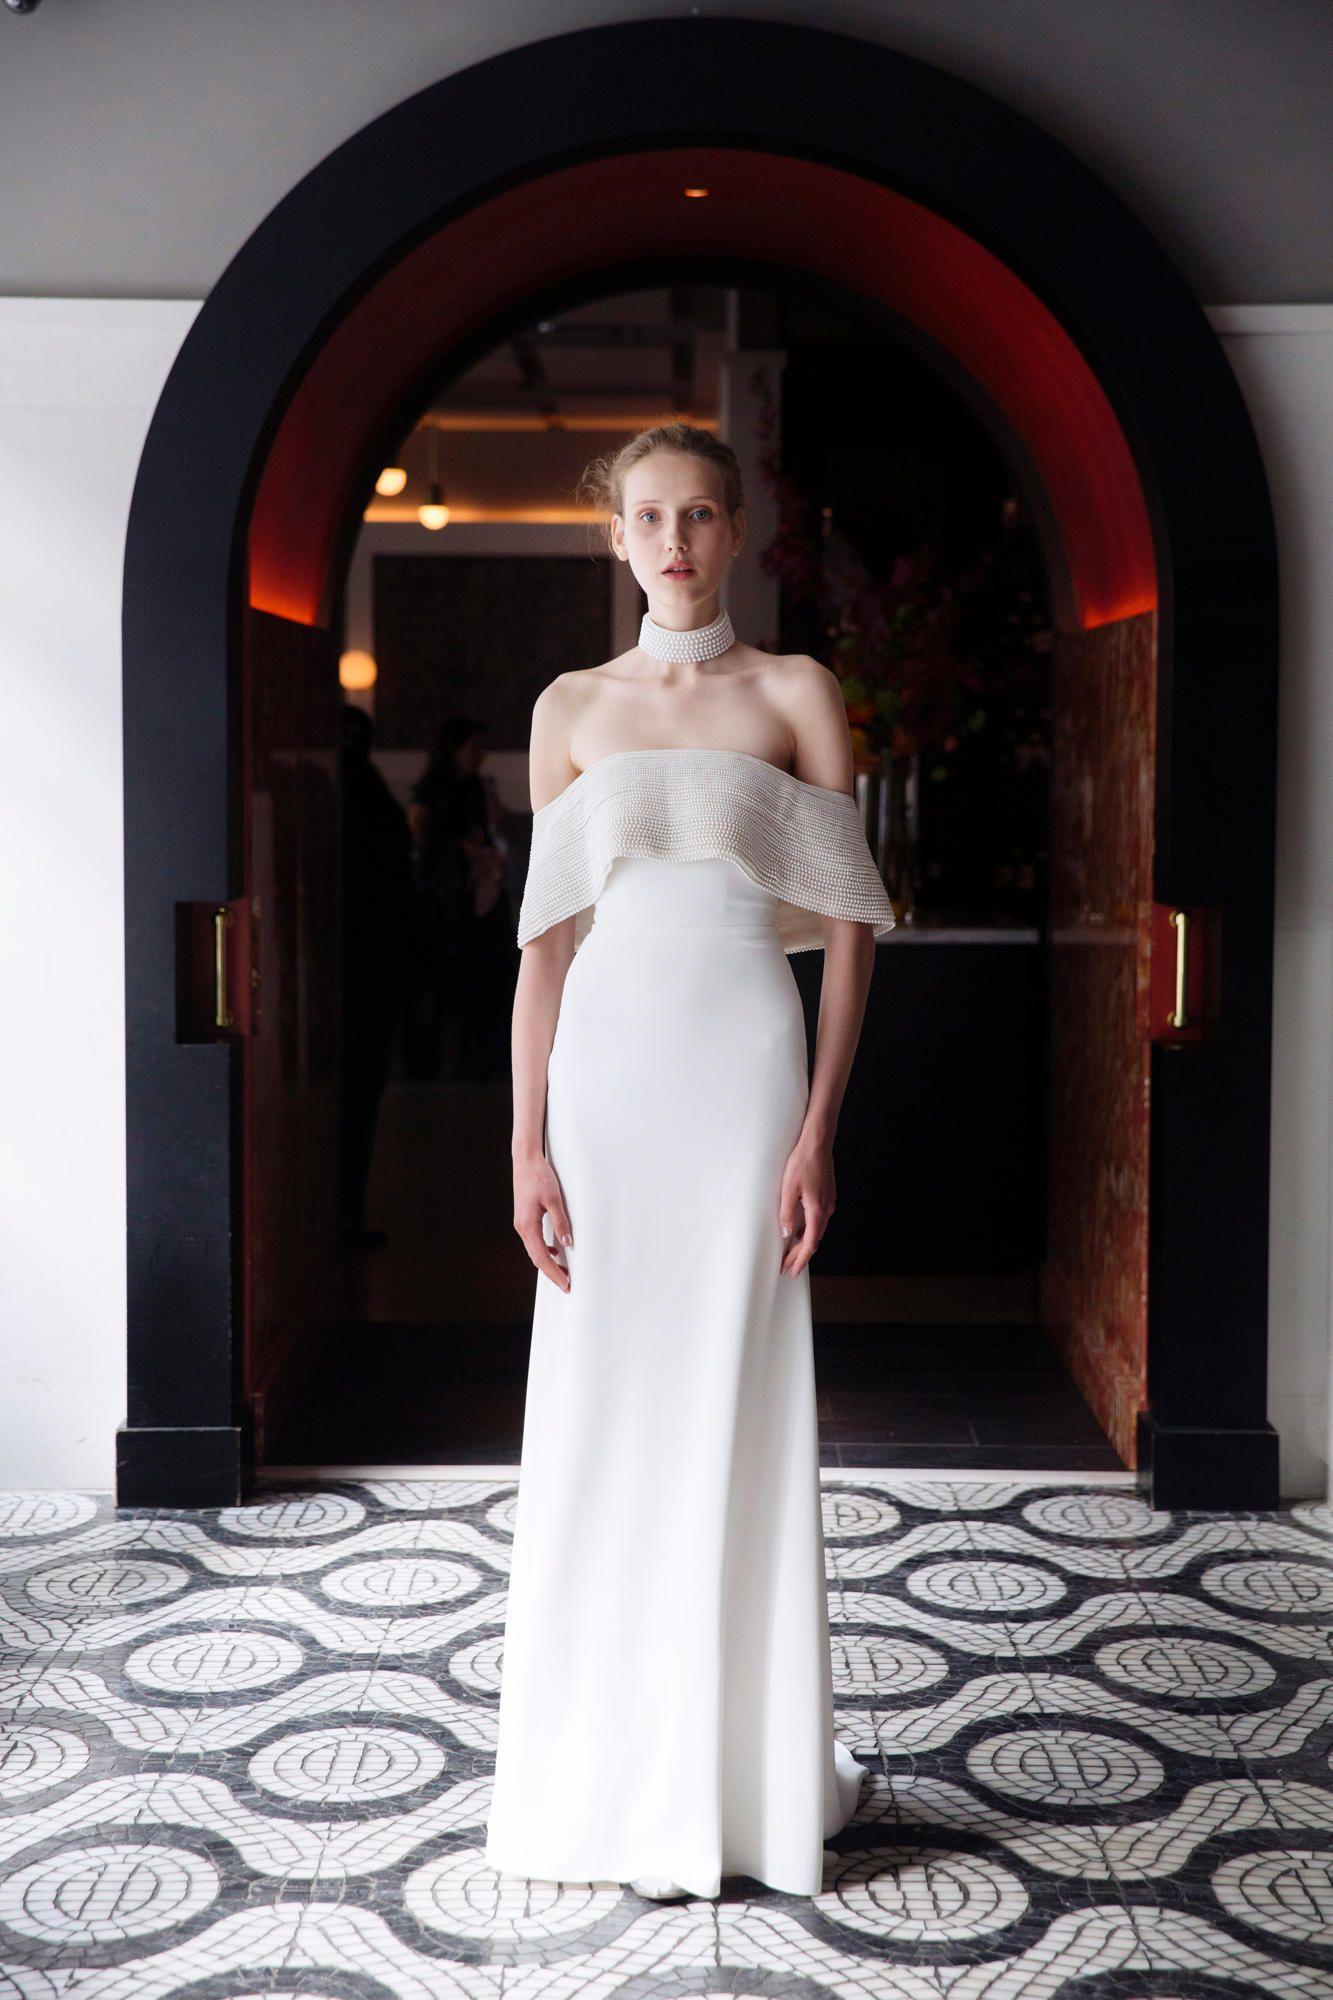 lela-rose-spring-2018-bridal-pearl-gown Tendências de vestidos de noiva para 2018